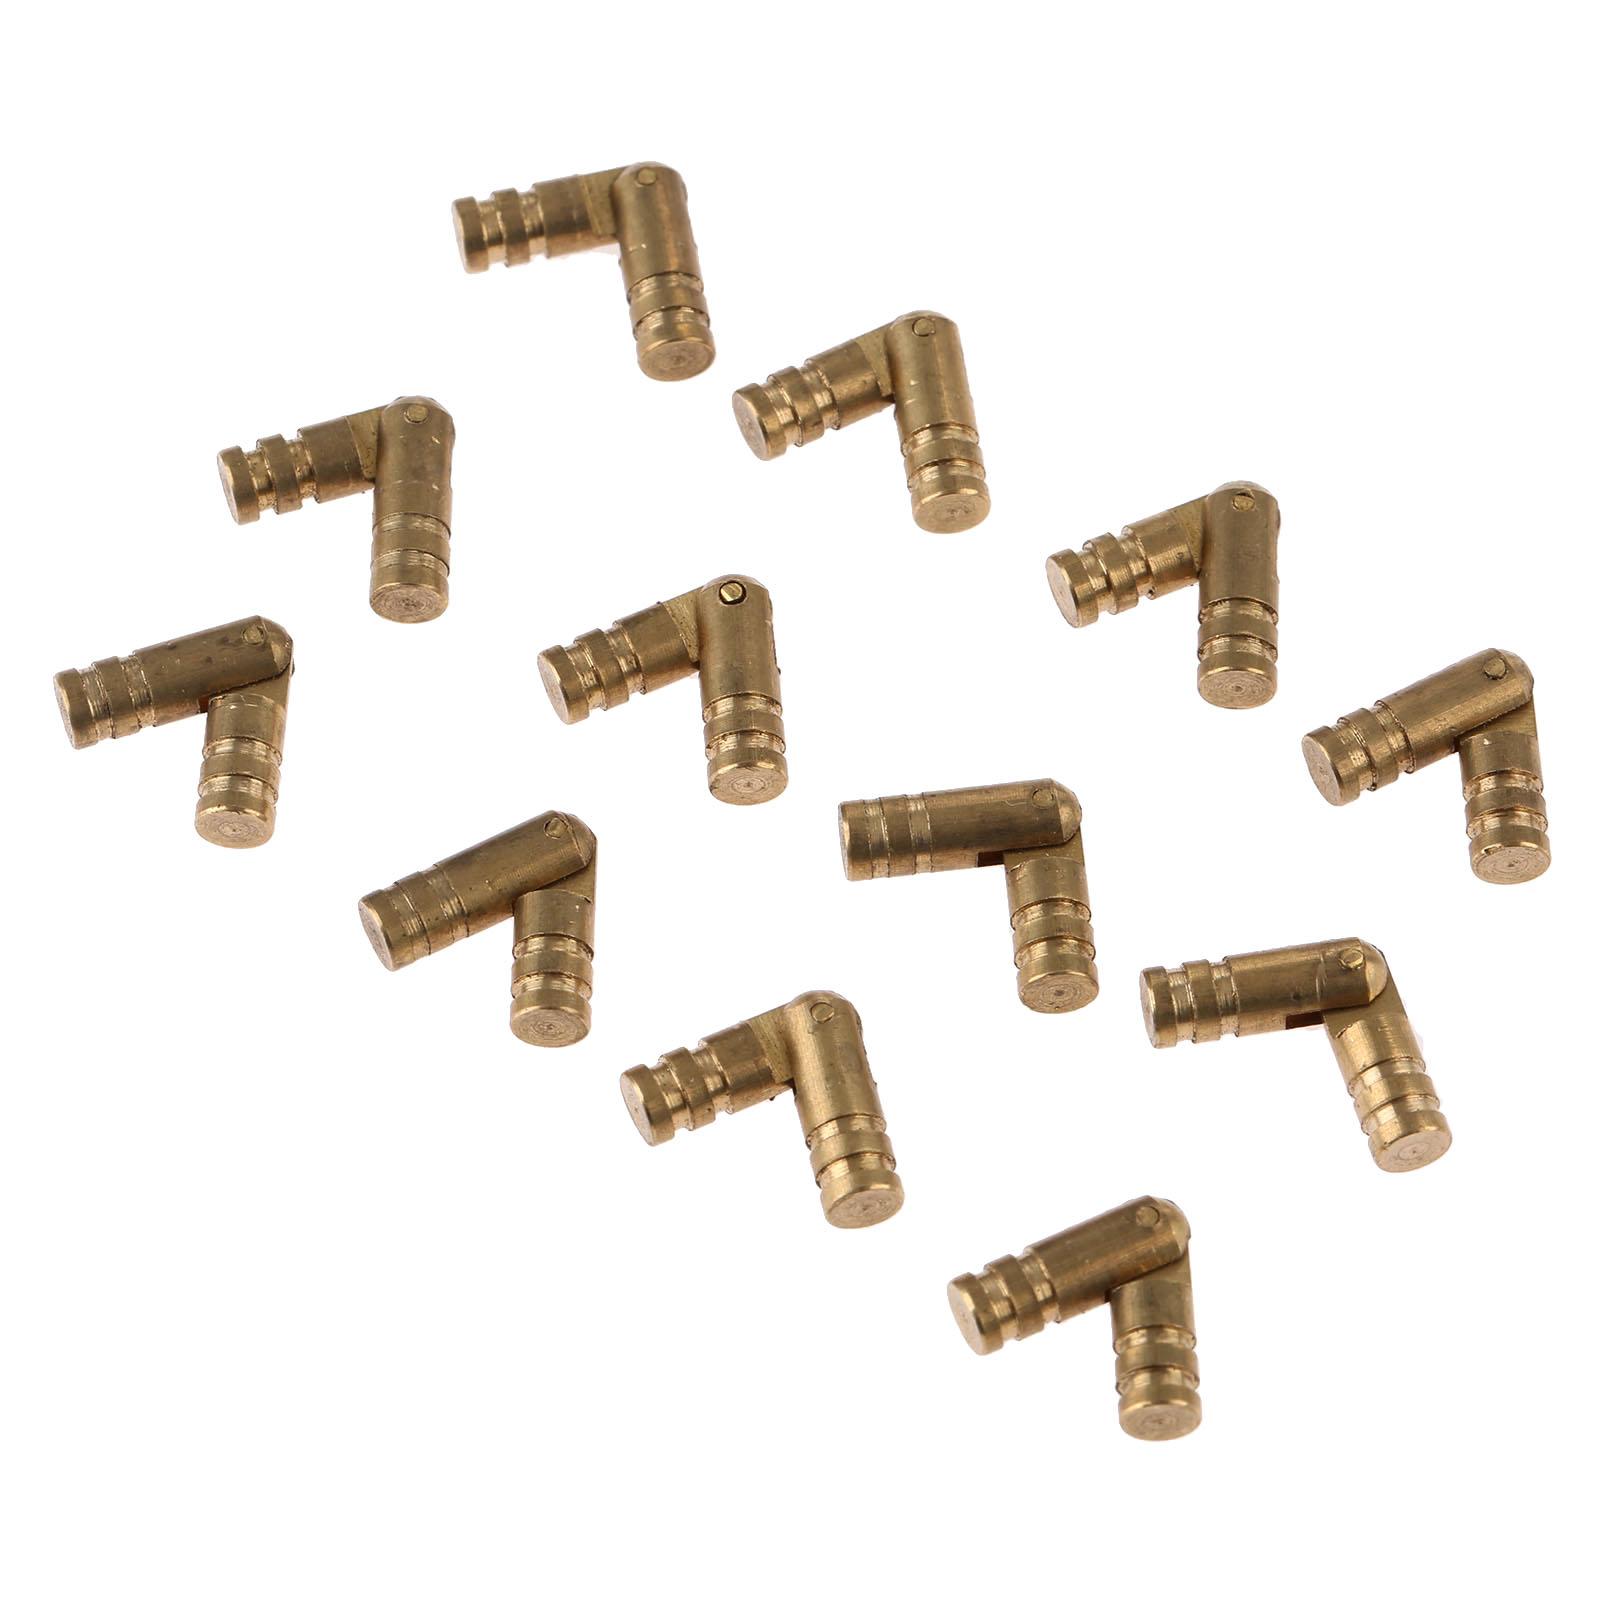 unids puro cobre latn barril bisagra joyero gabinete oculto oculto invisible barril bisagra muebles hardware